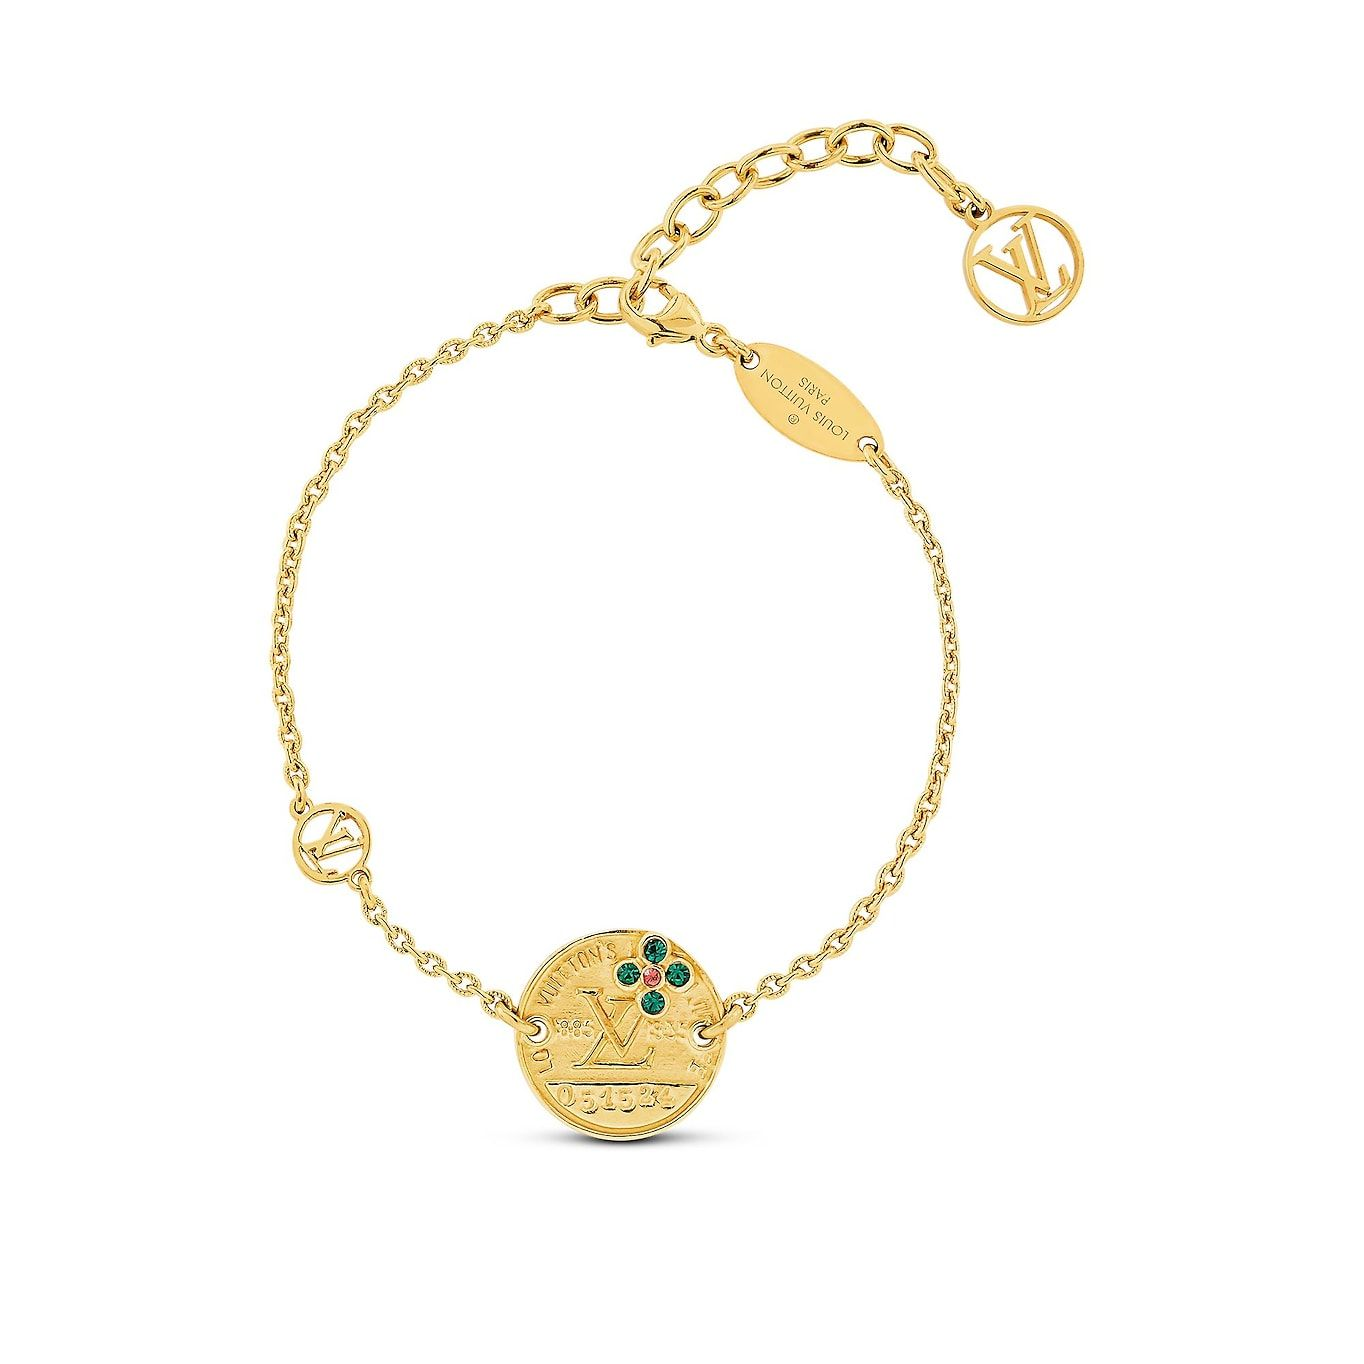 b41d48ad62 Miss Windsor Medal Bracelet in 2019   adoption   Louis vuitton ...